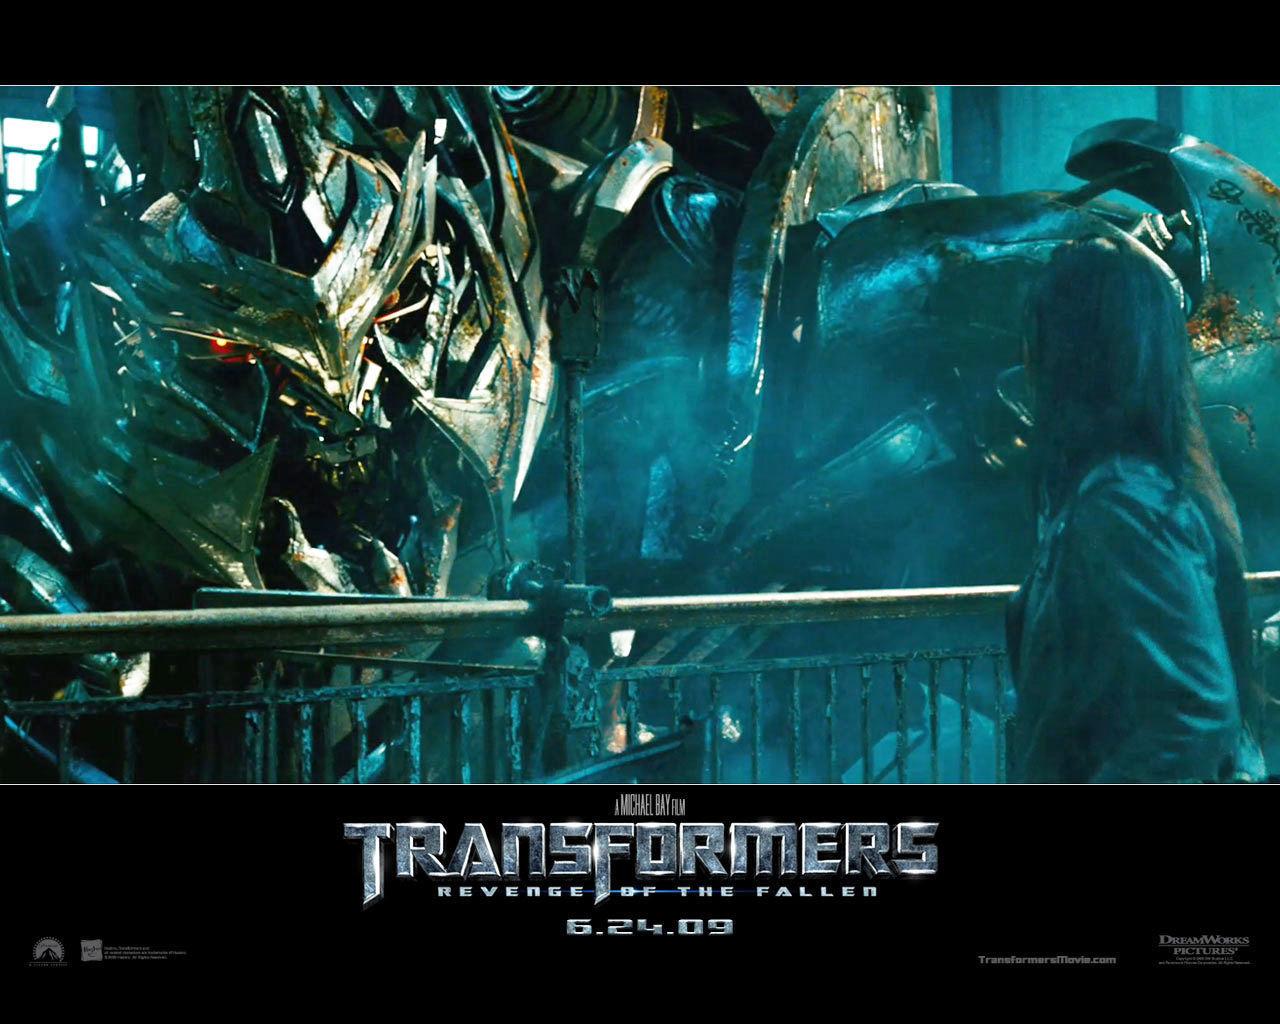 Transformers: Revenge of the Fallen - Transformers ...